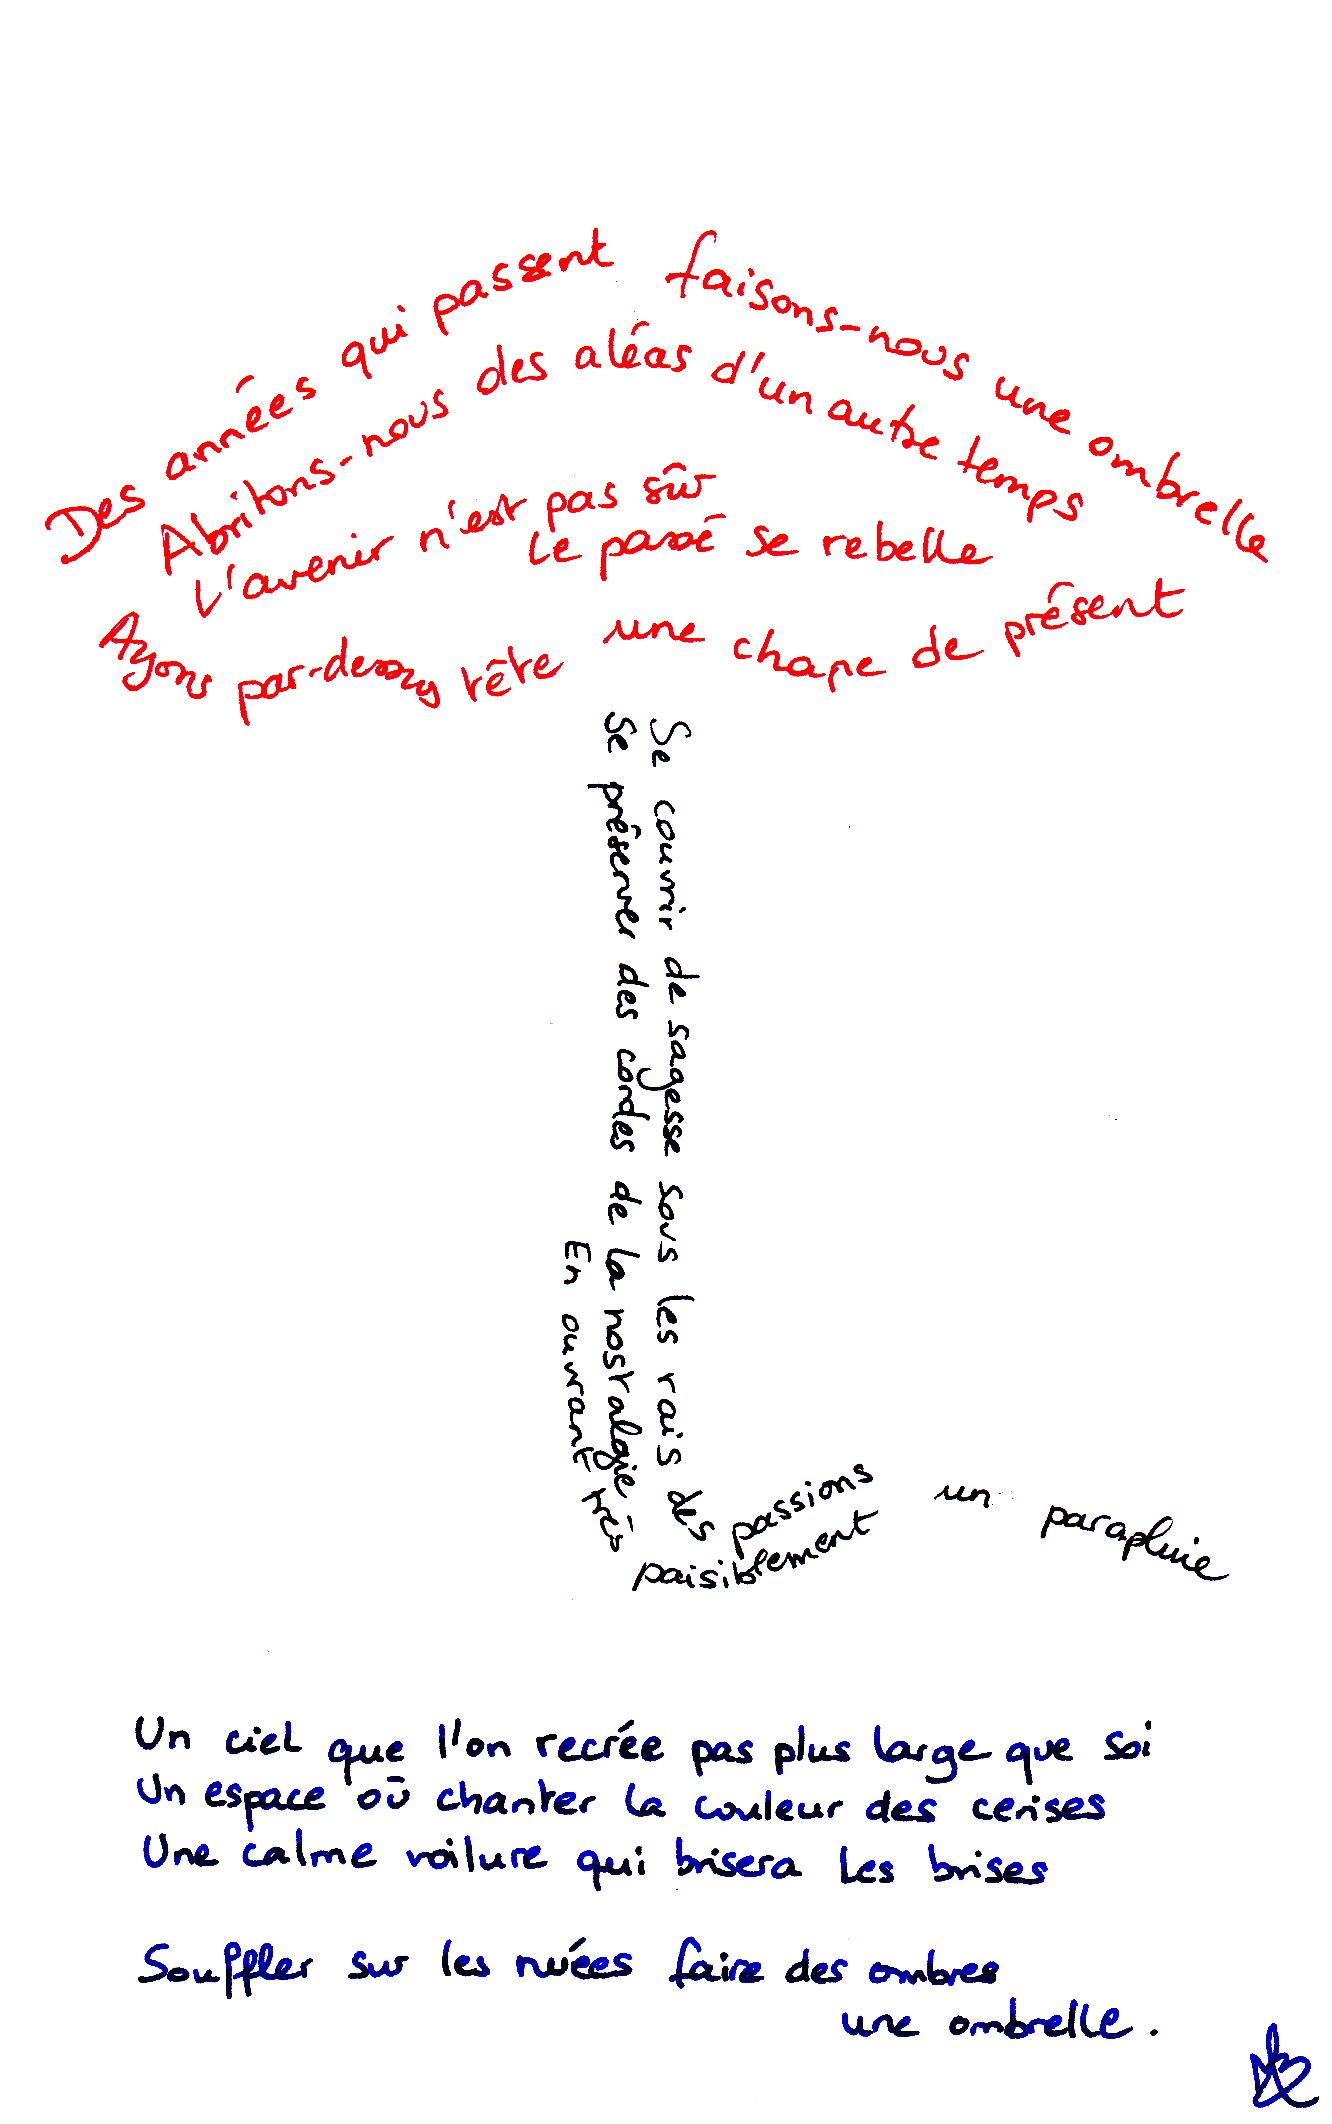 Calligramme Ombrelle